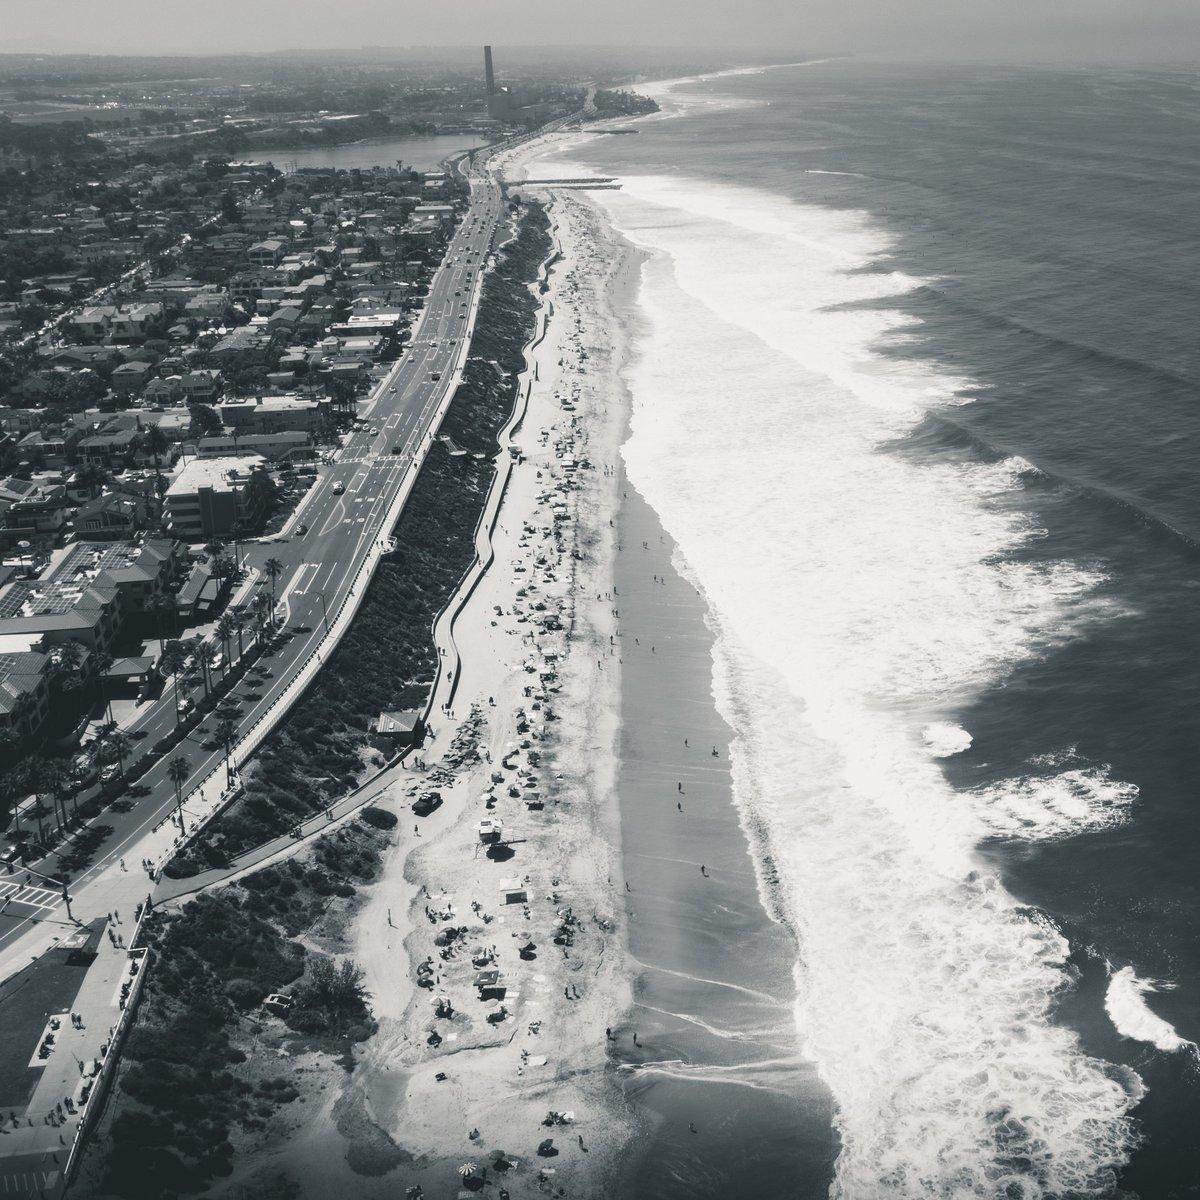 ᑕᗩᖇᒪᔕᗷᗩᗪᔕᗯᗩƳ  #dji #mavicpro2 #earthpix #travelblogger #travelphotography #beachlife #dronephotography #aerialphotography #droneshot #dronepics #drone #blackandwhite #wonderlust #carlsbad #sandiego #fromwhereidrone #blackandwhitephotography  #jeffreyclaytonphotography https://t.co/fQaWpY2Qlp